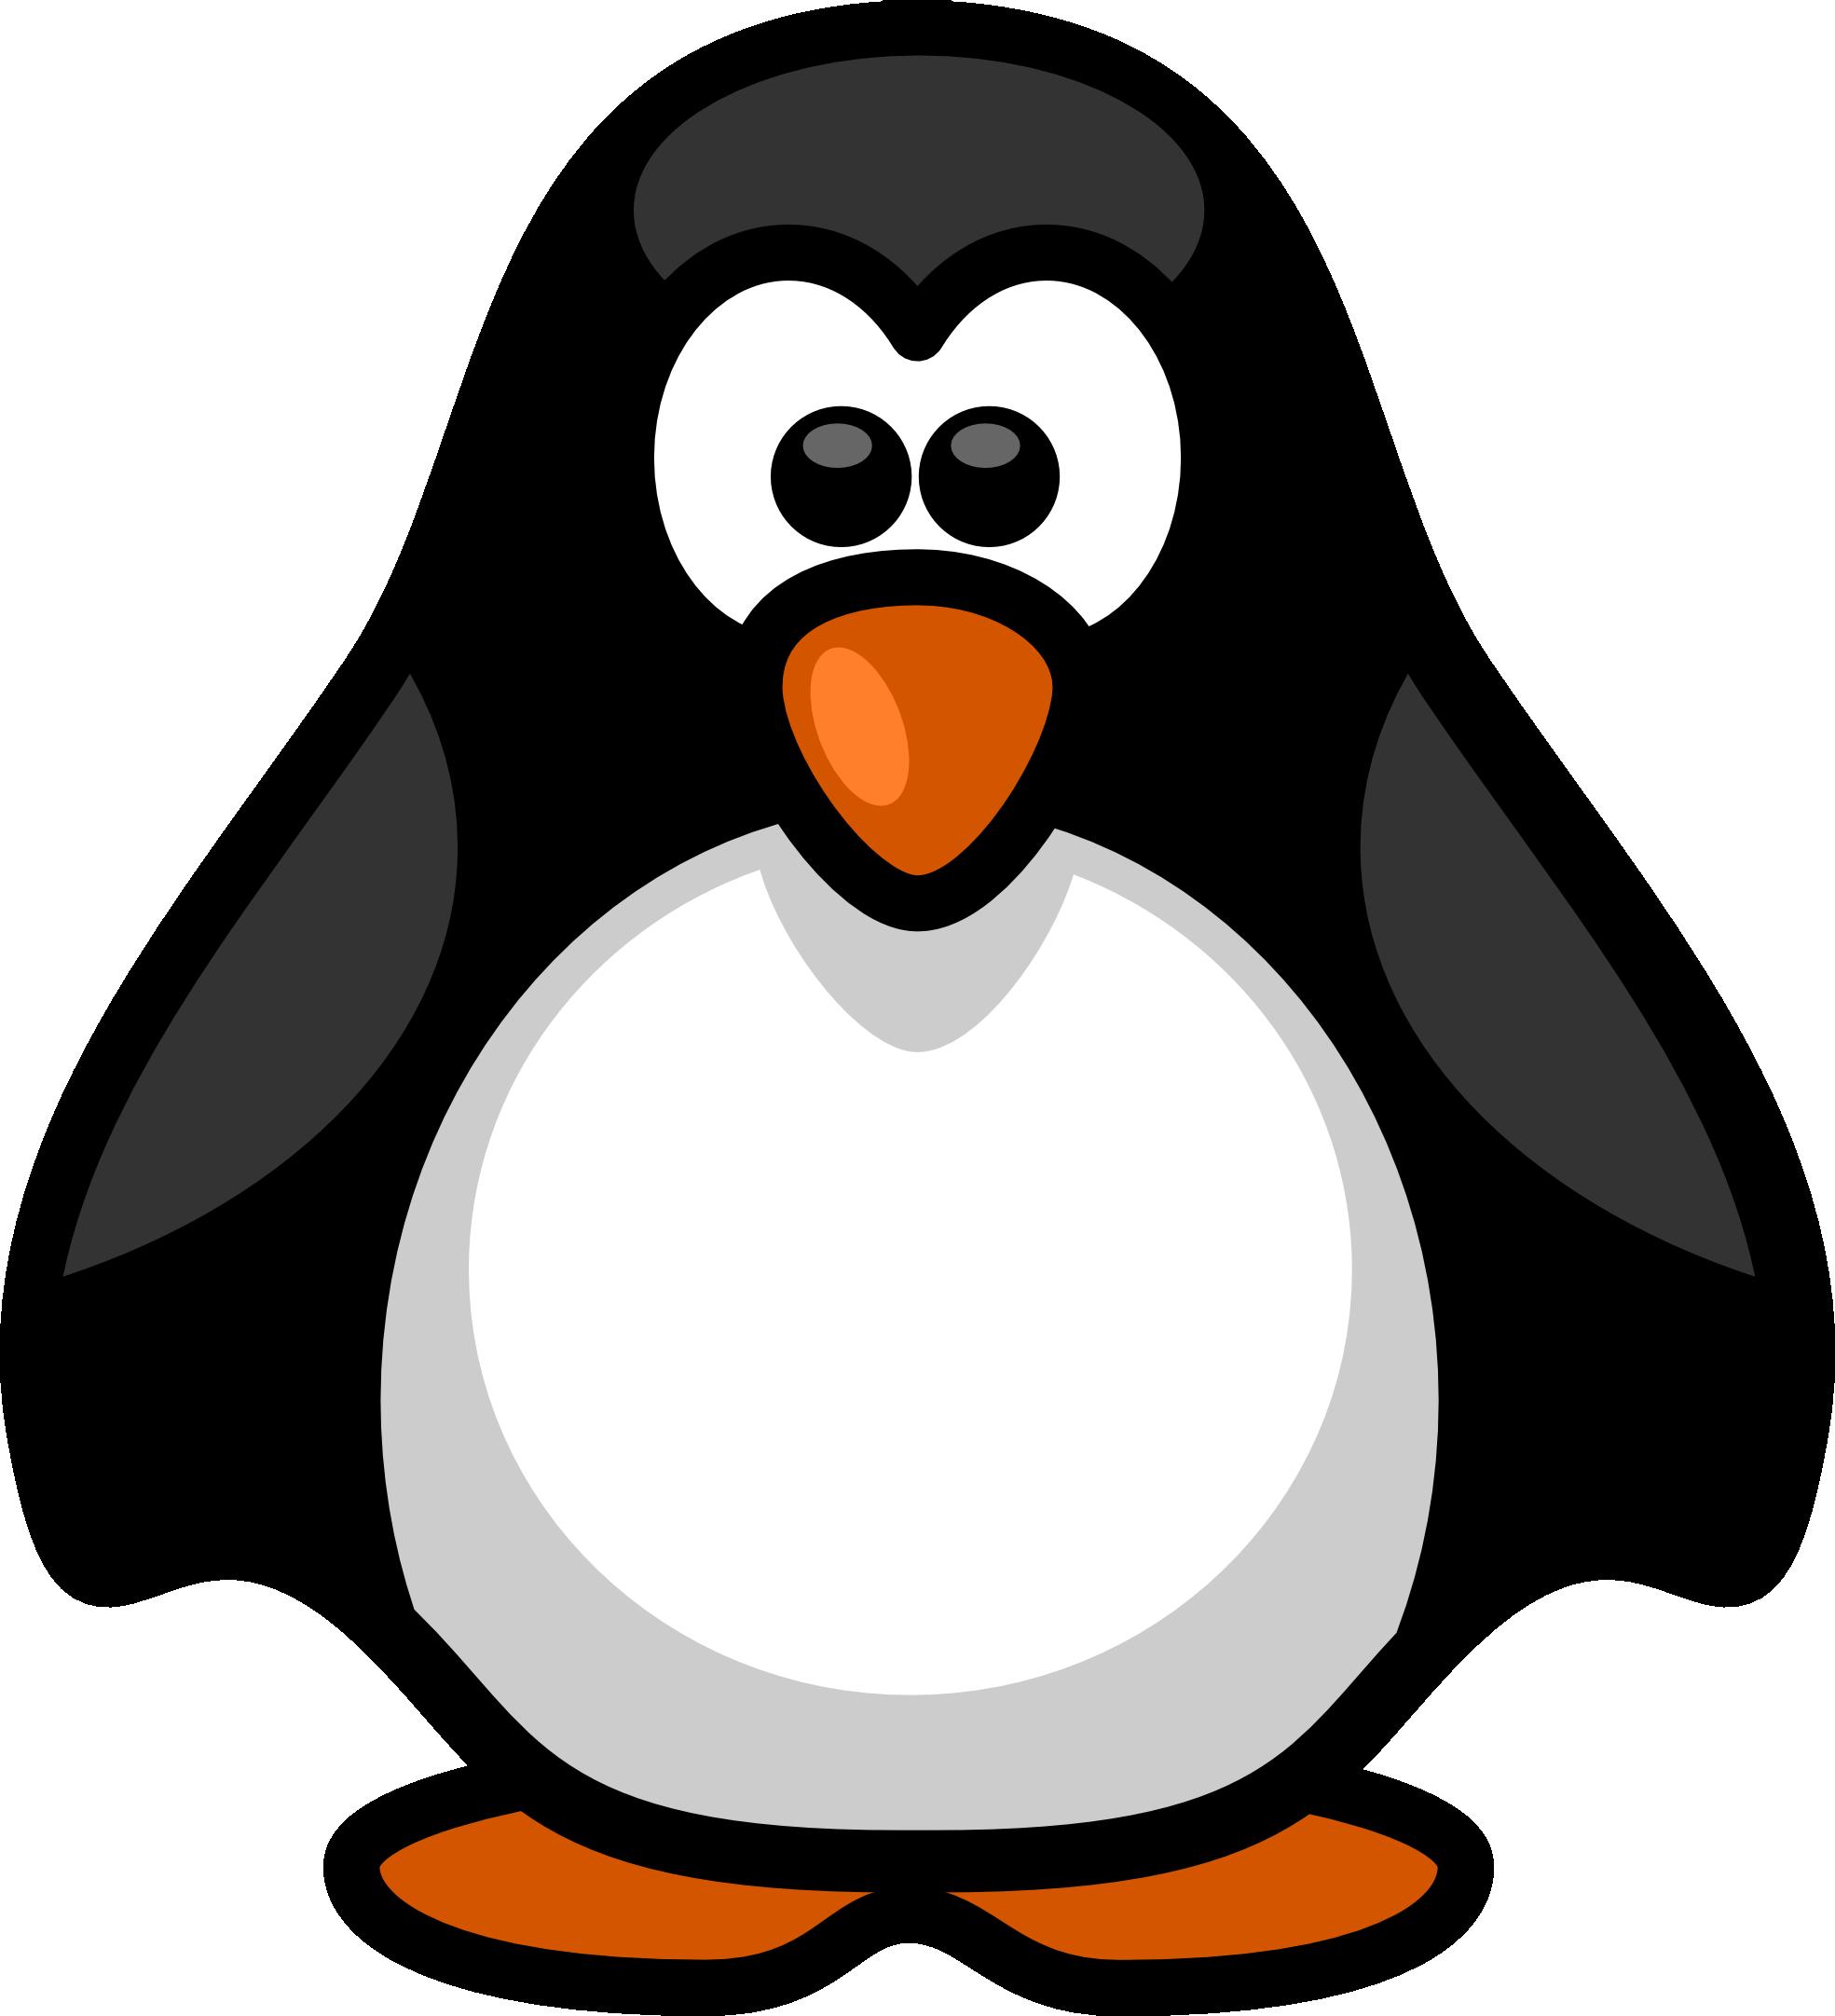 Penguin Clip Art Printable Free | Clipart Panda - Free Clipart Images